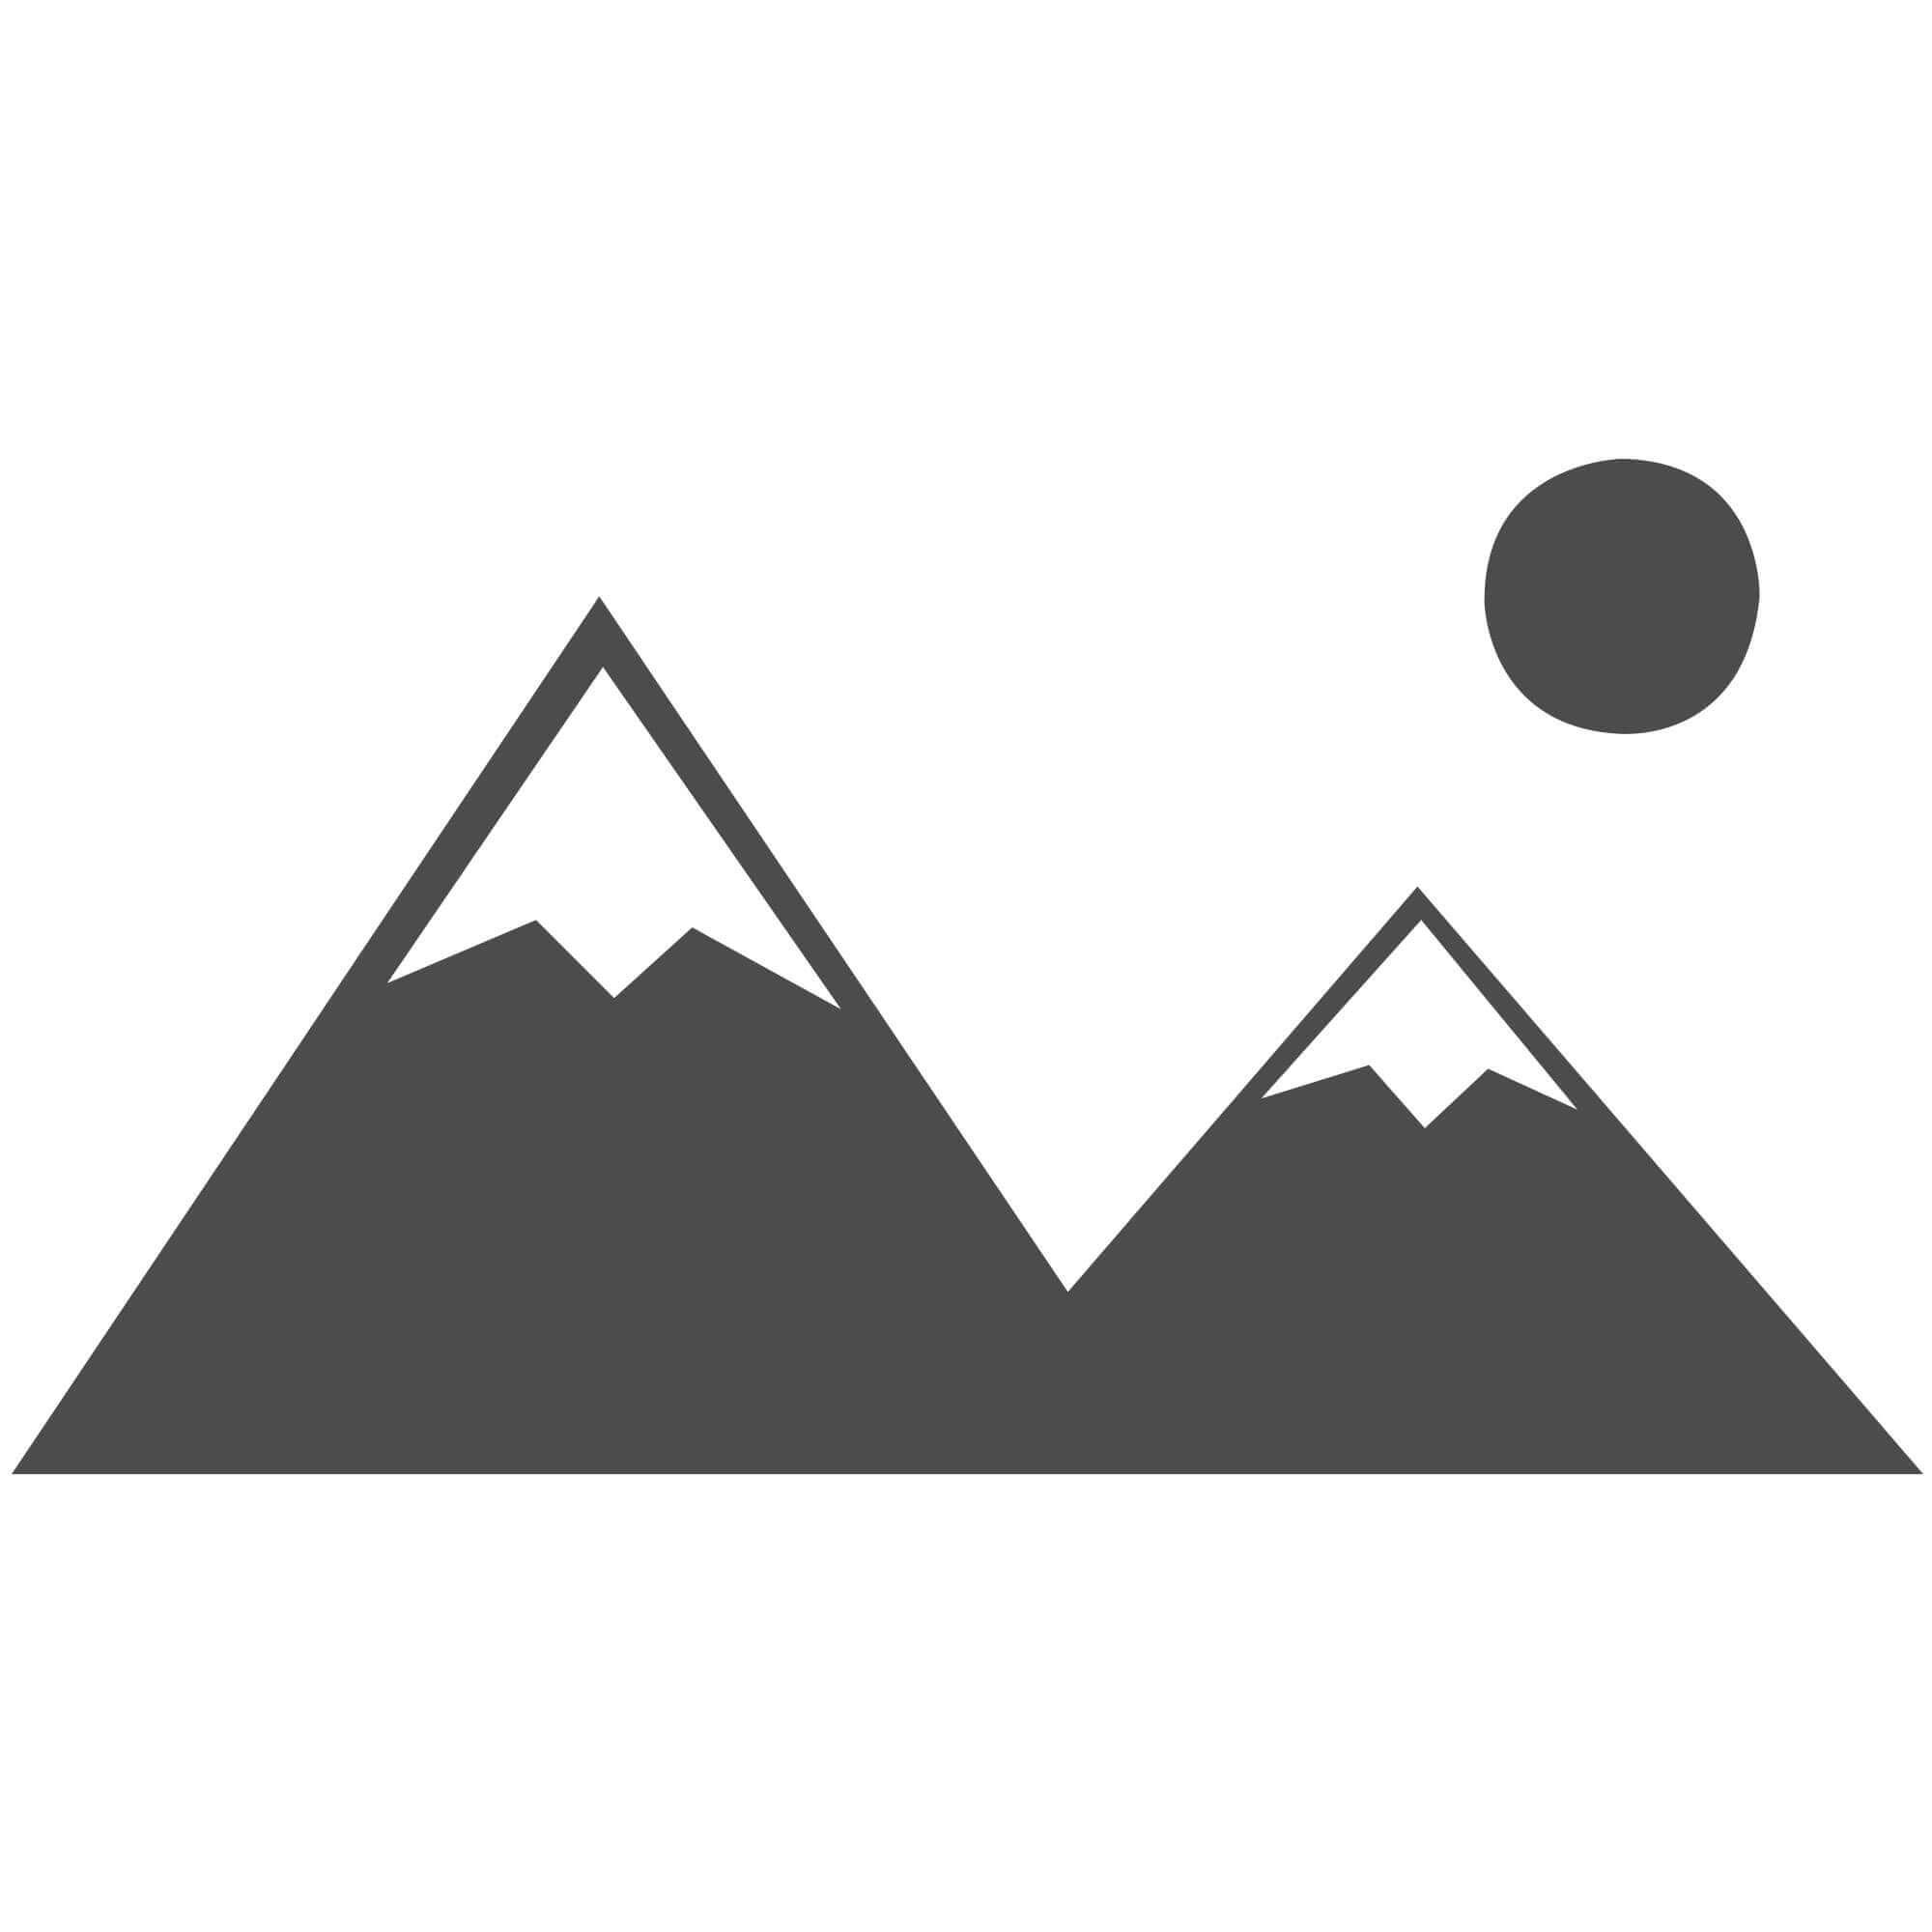 "Athena Shaggy Rug - Taupe - Size 120 x 170 cm (4' x 5'7"")"